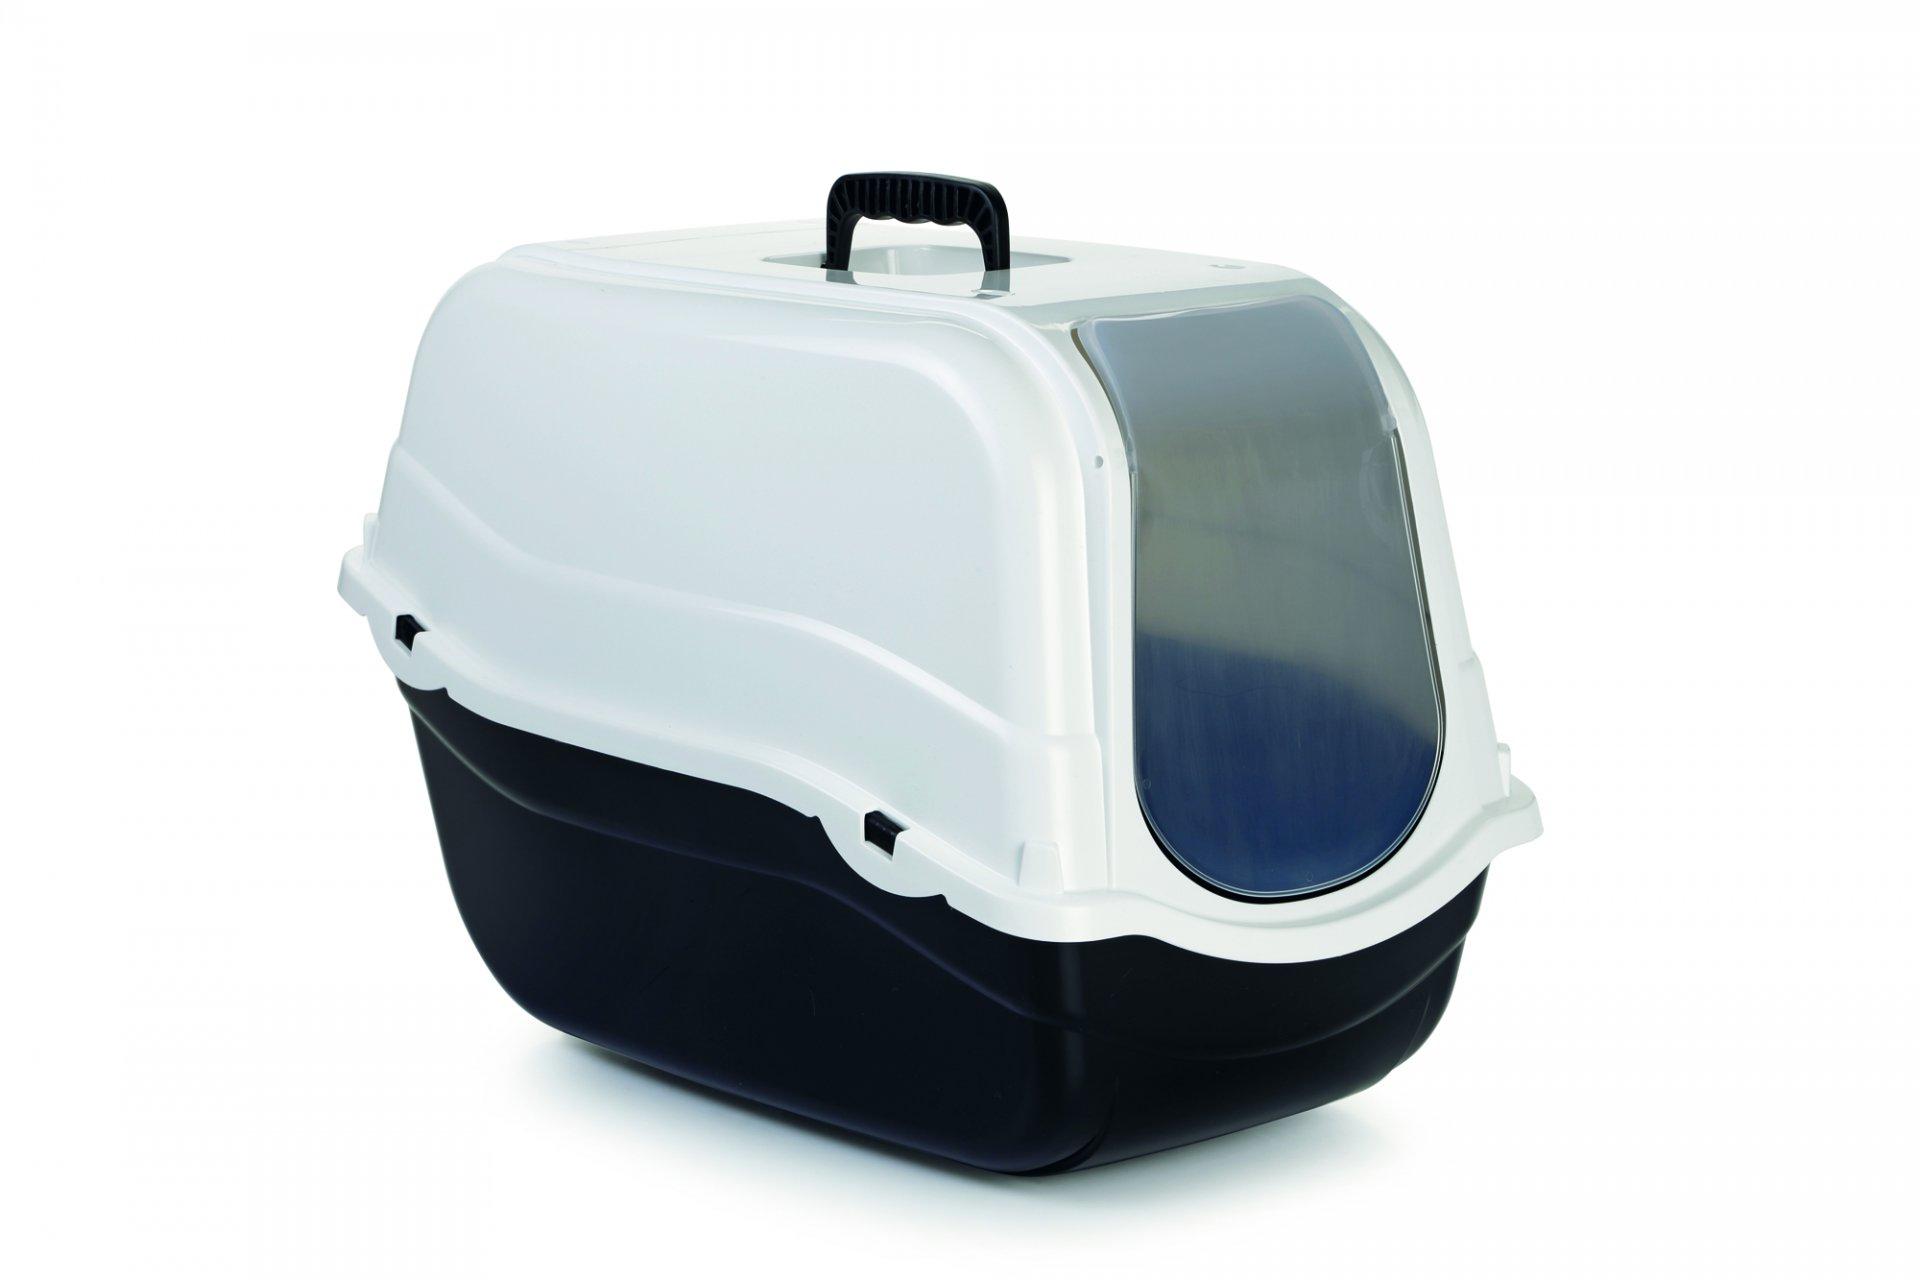 Beeztees Toaleta pro kočky ROMEO černá/bílá 57x39x41cm